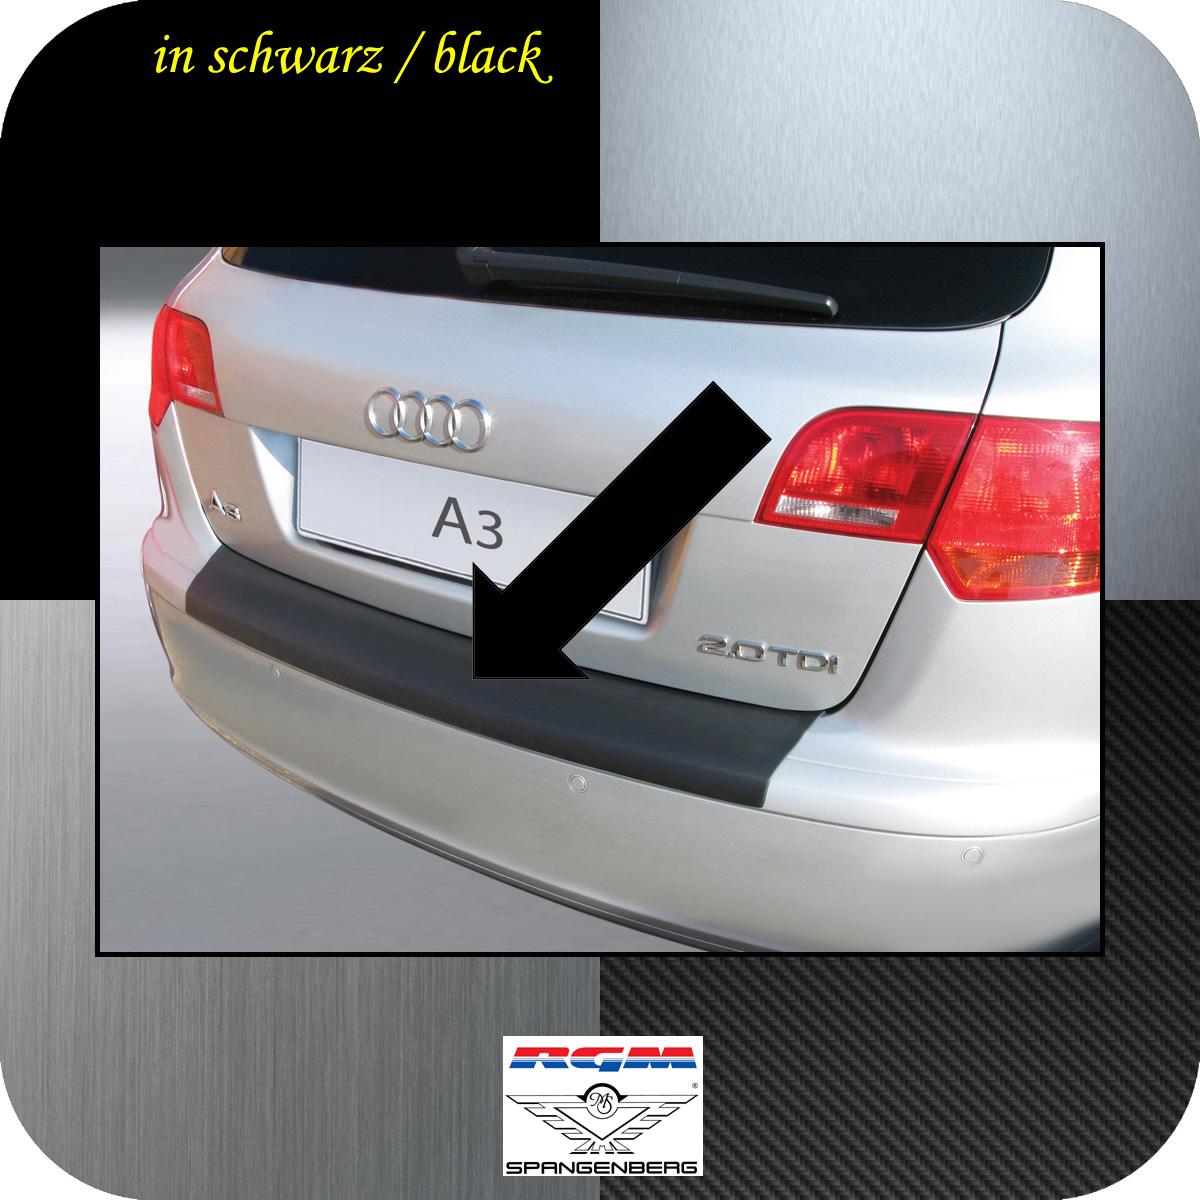 Ladekantenschutz schwarz Audi A3 Sportback vor facelift 2004-2008 3500361